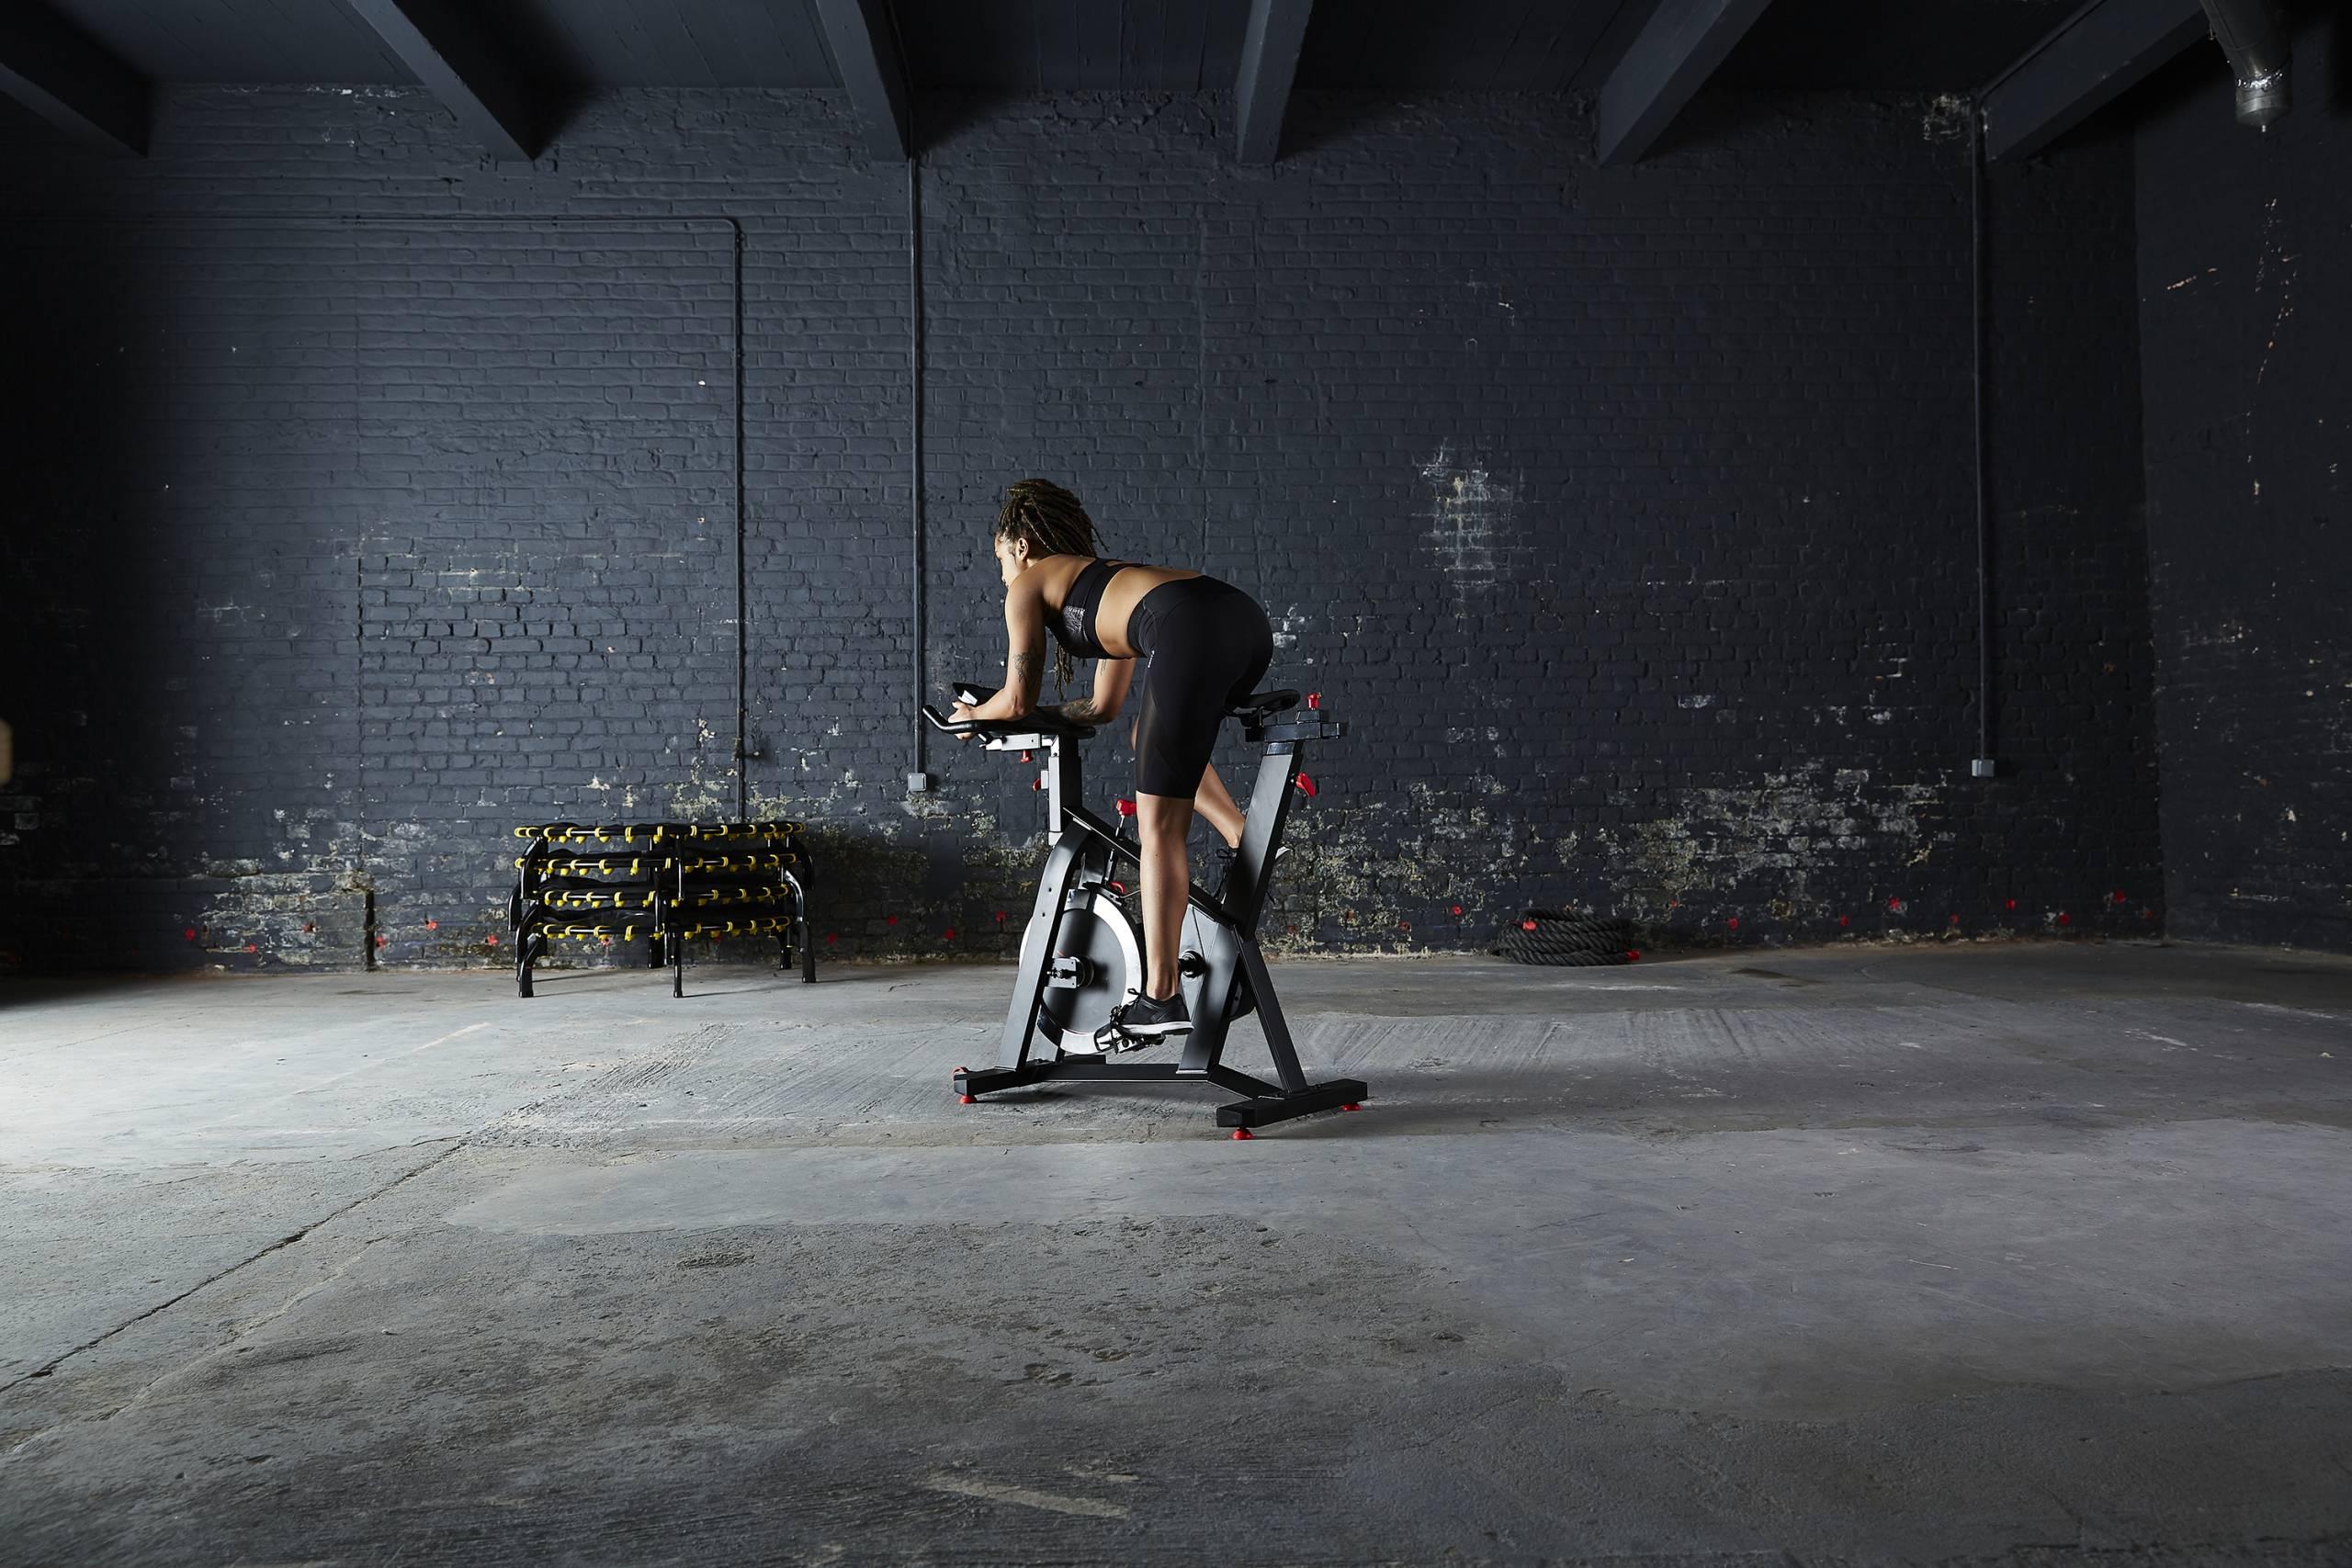 Decathlon Domyos exercise bike woman riding